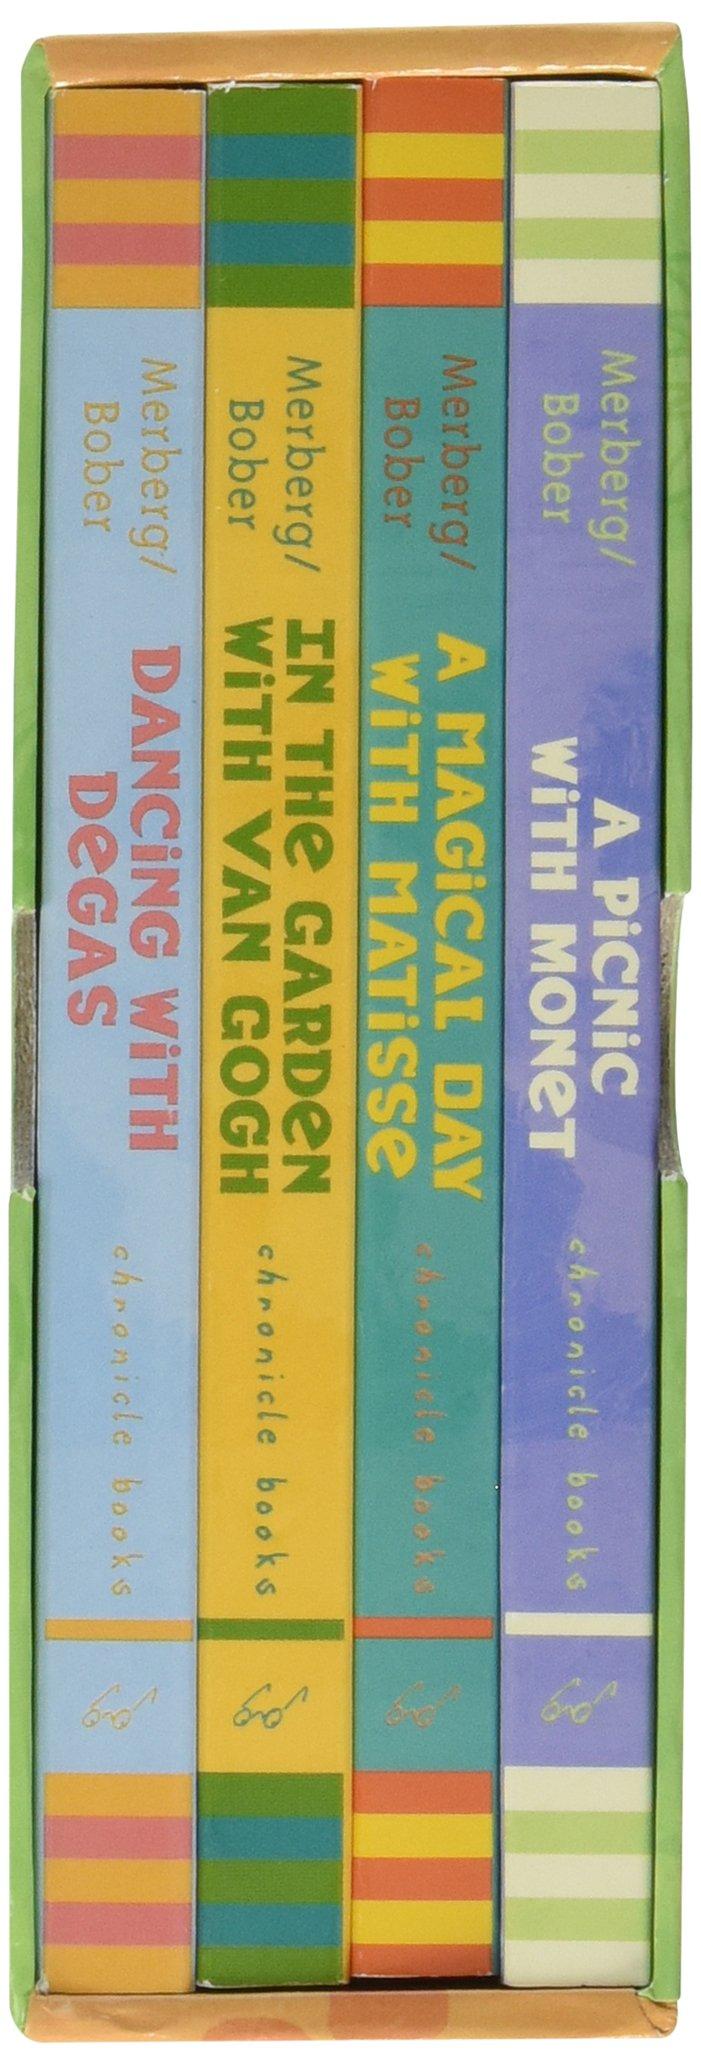 Mini Masters Boxed Set by Chronicle Books (Image #3)